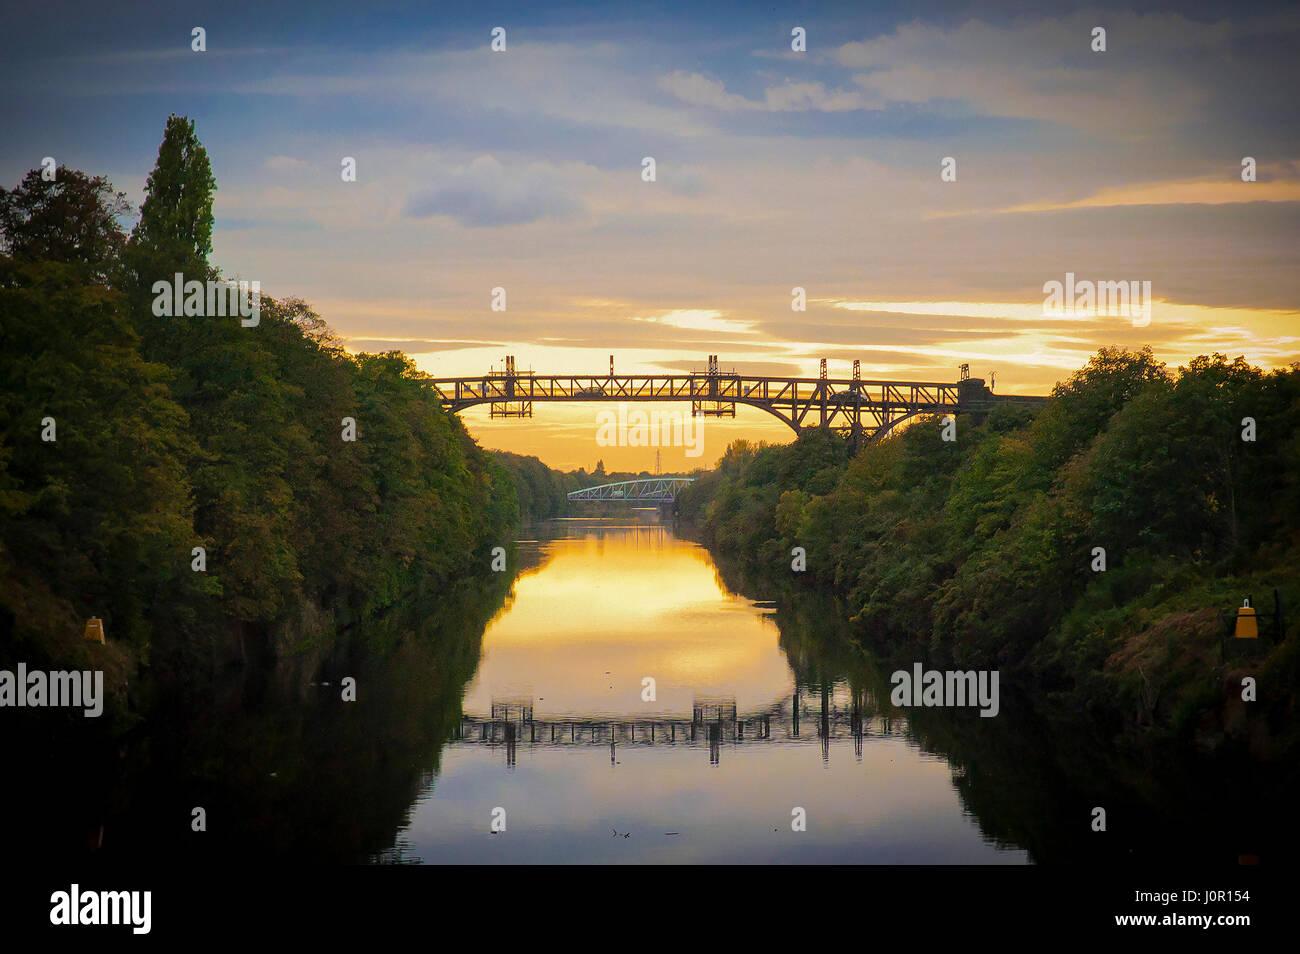 Manchester ship canal. Warrington cantilever bridge sunset - Stock Image